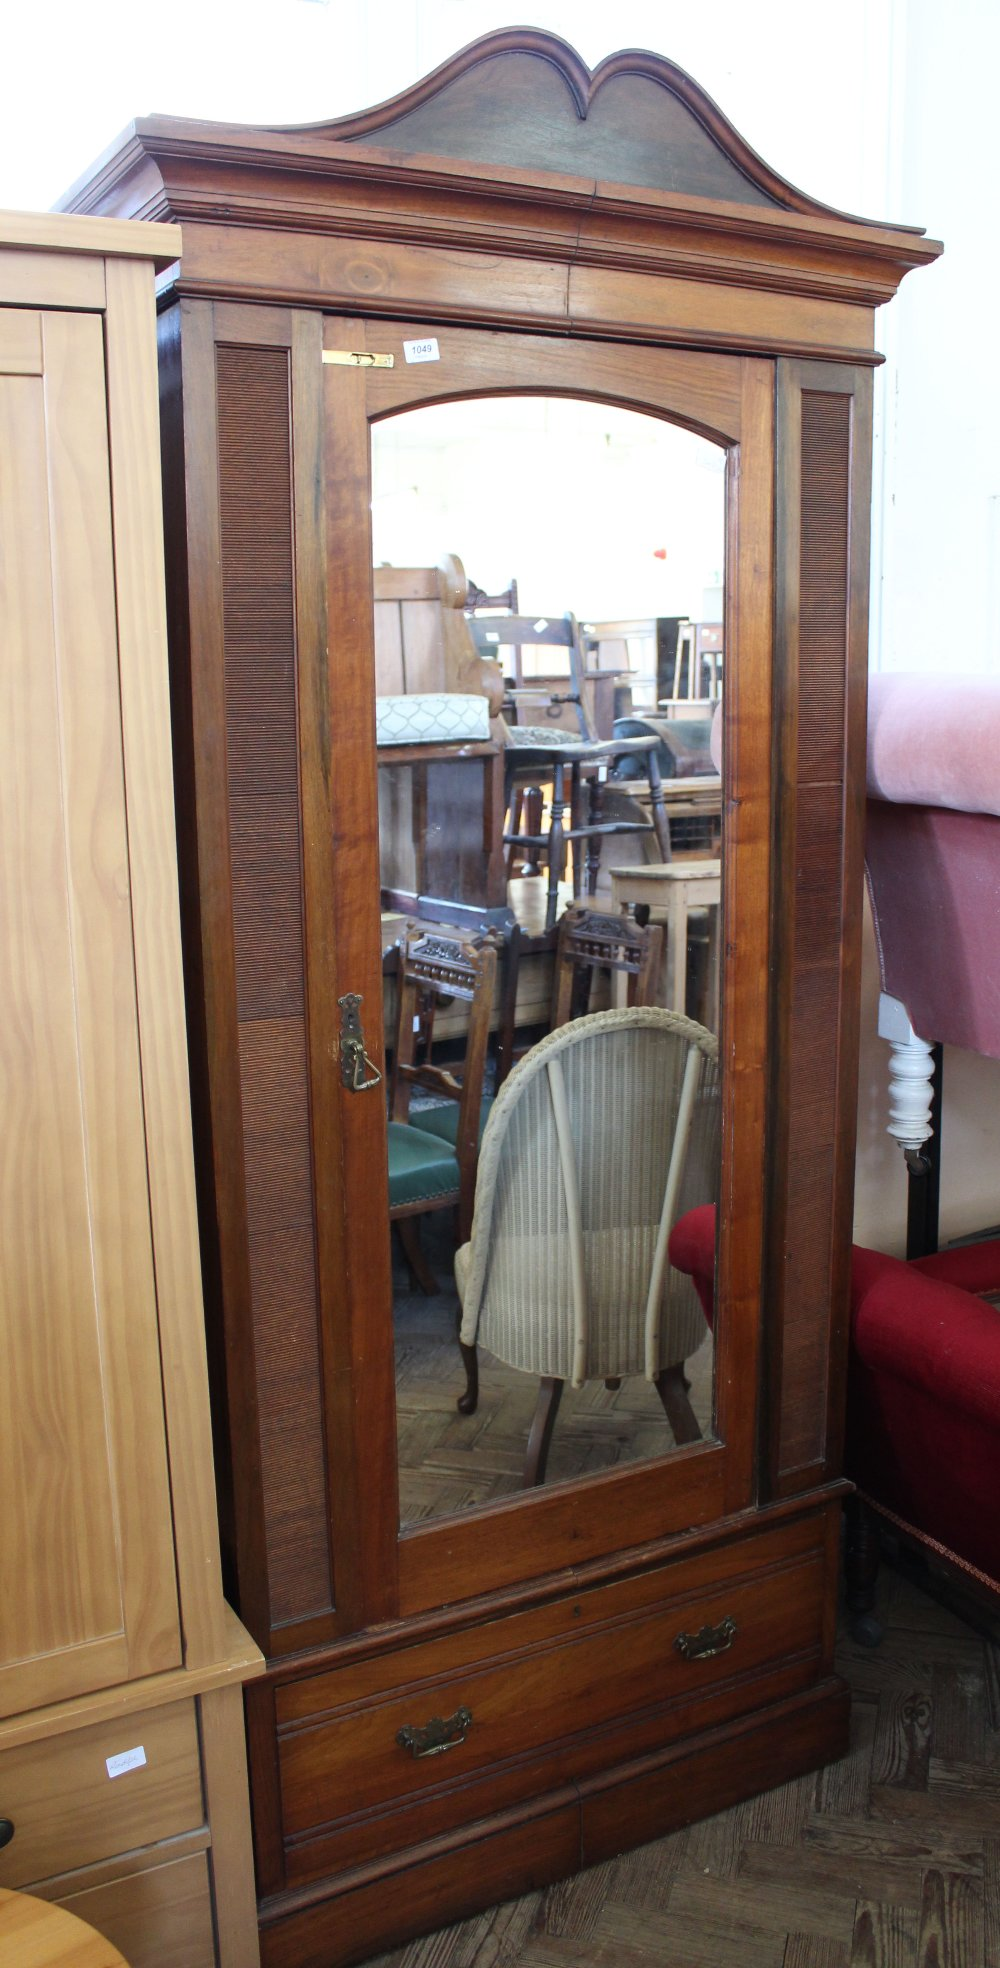 Lot 1049 - An Edwardian single wardrobe with drawer below